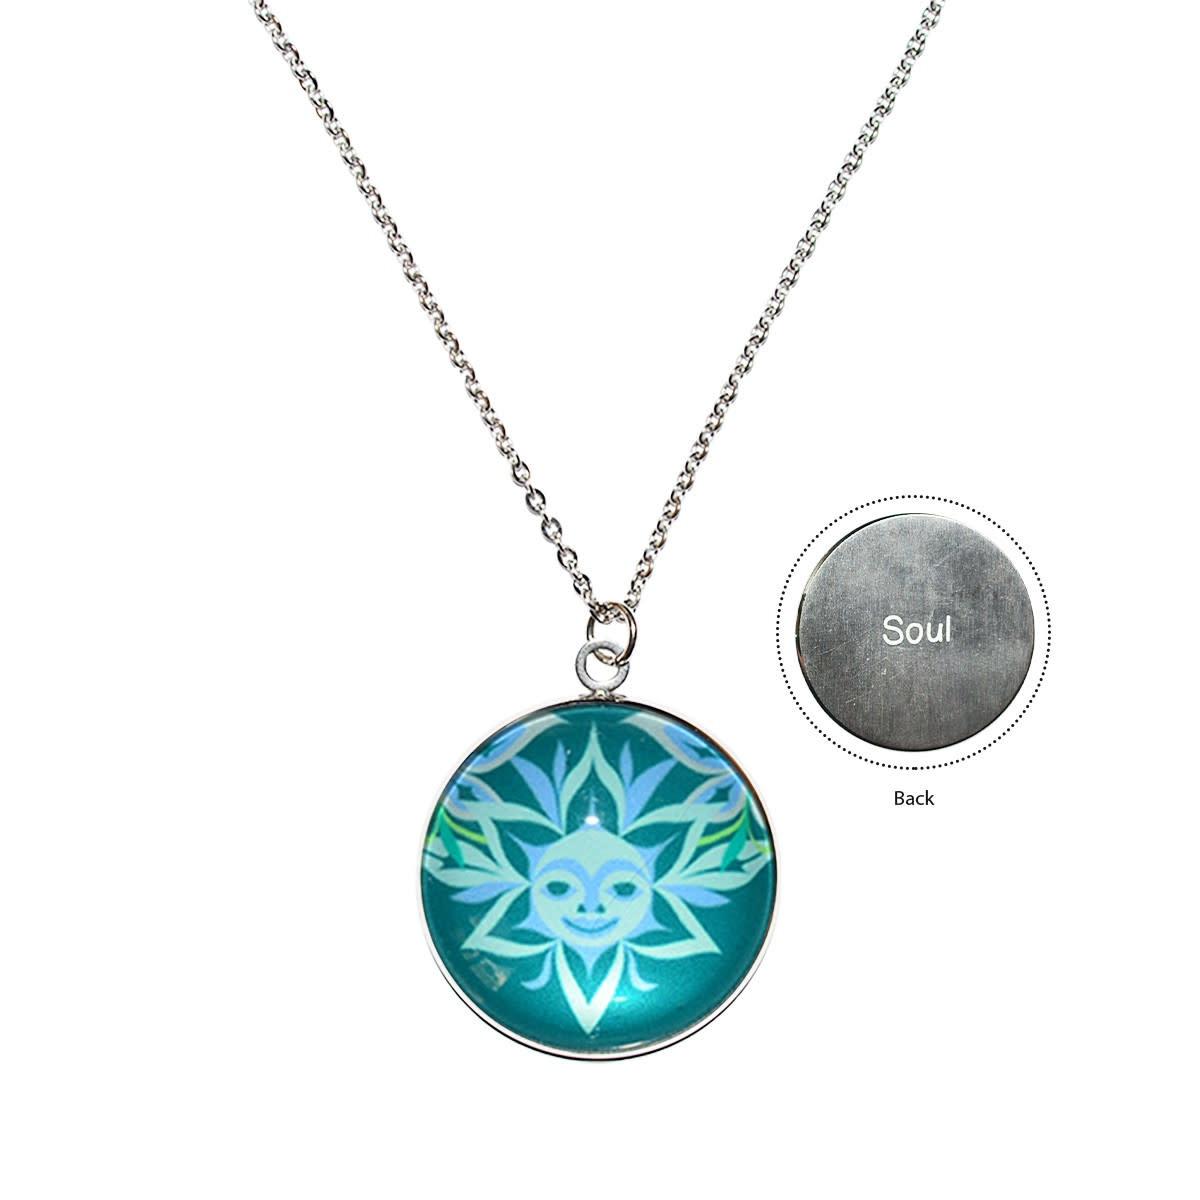 Soul Blossom Charm Necklace by Simone Diamond-1